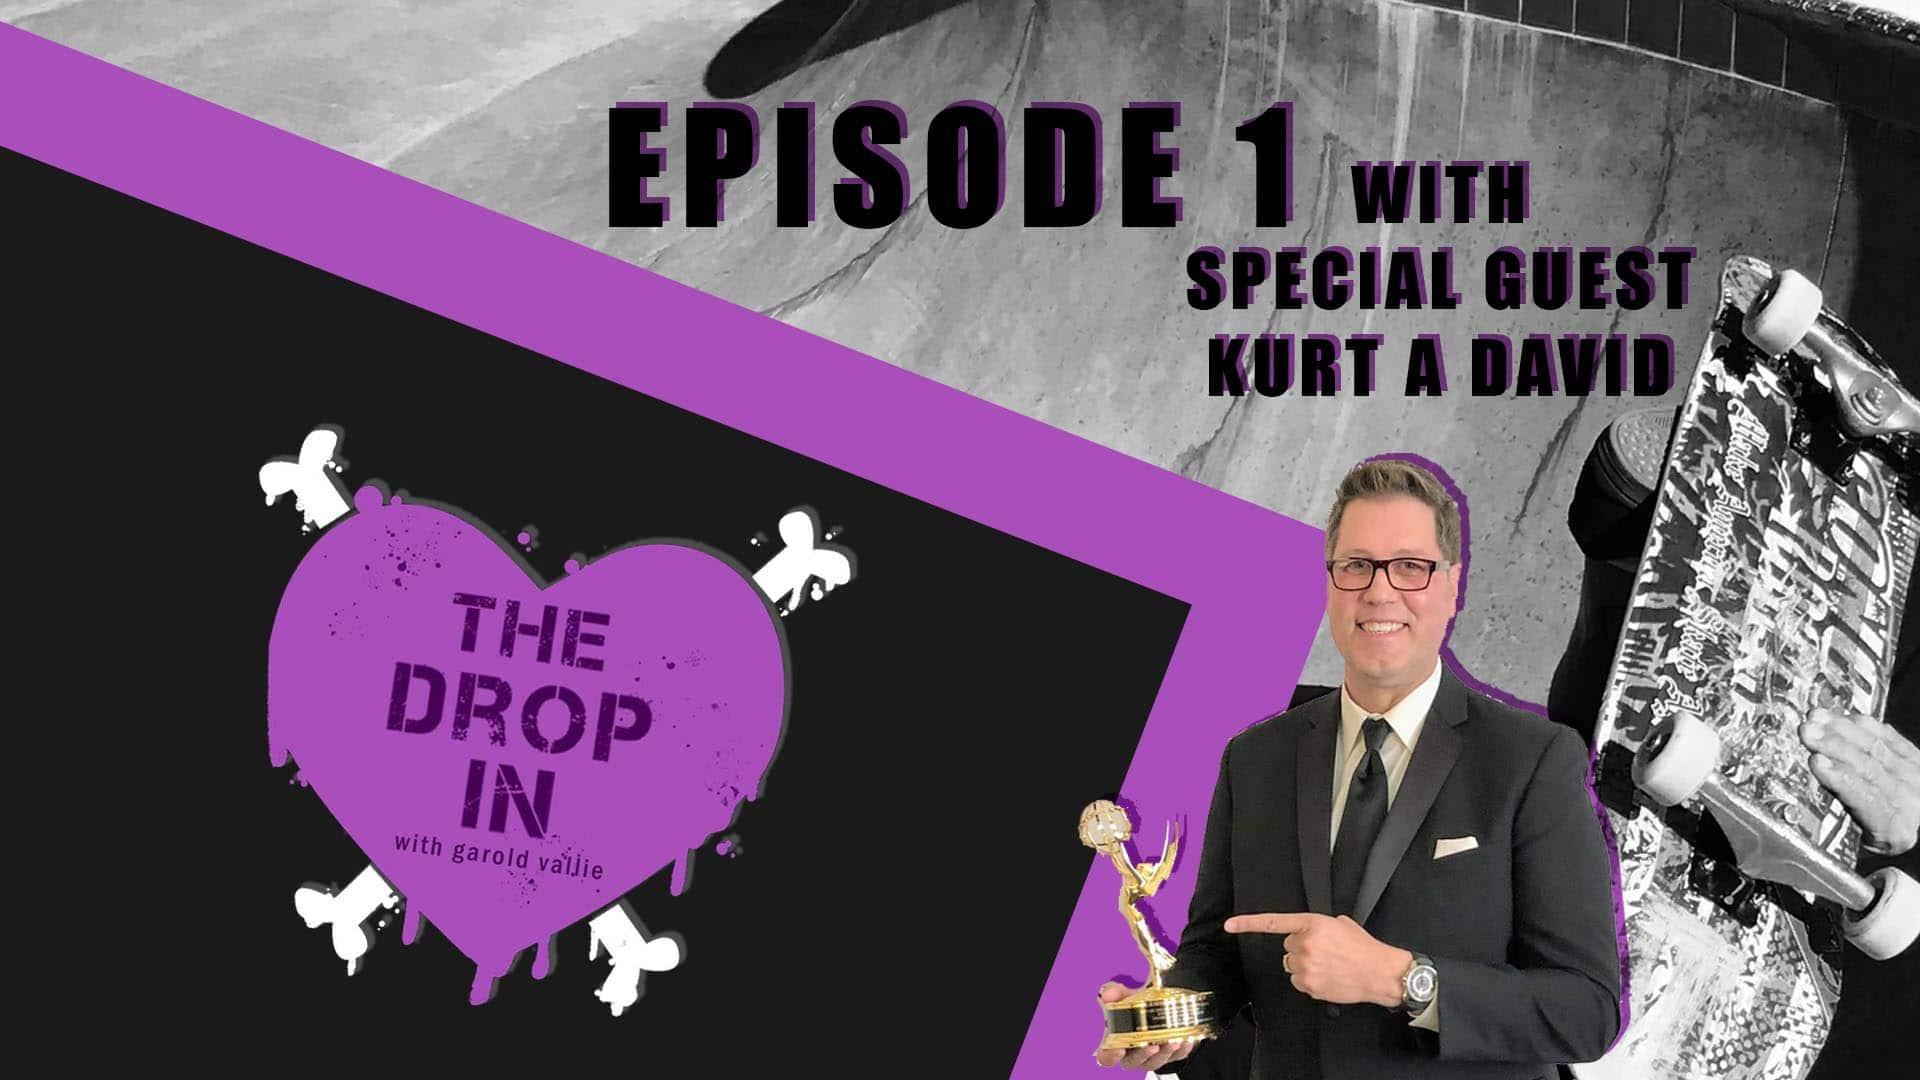 The Drop In with Garold Vallie - Episode 1